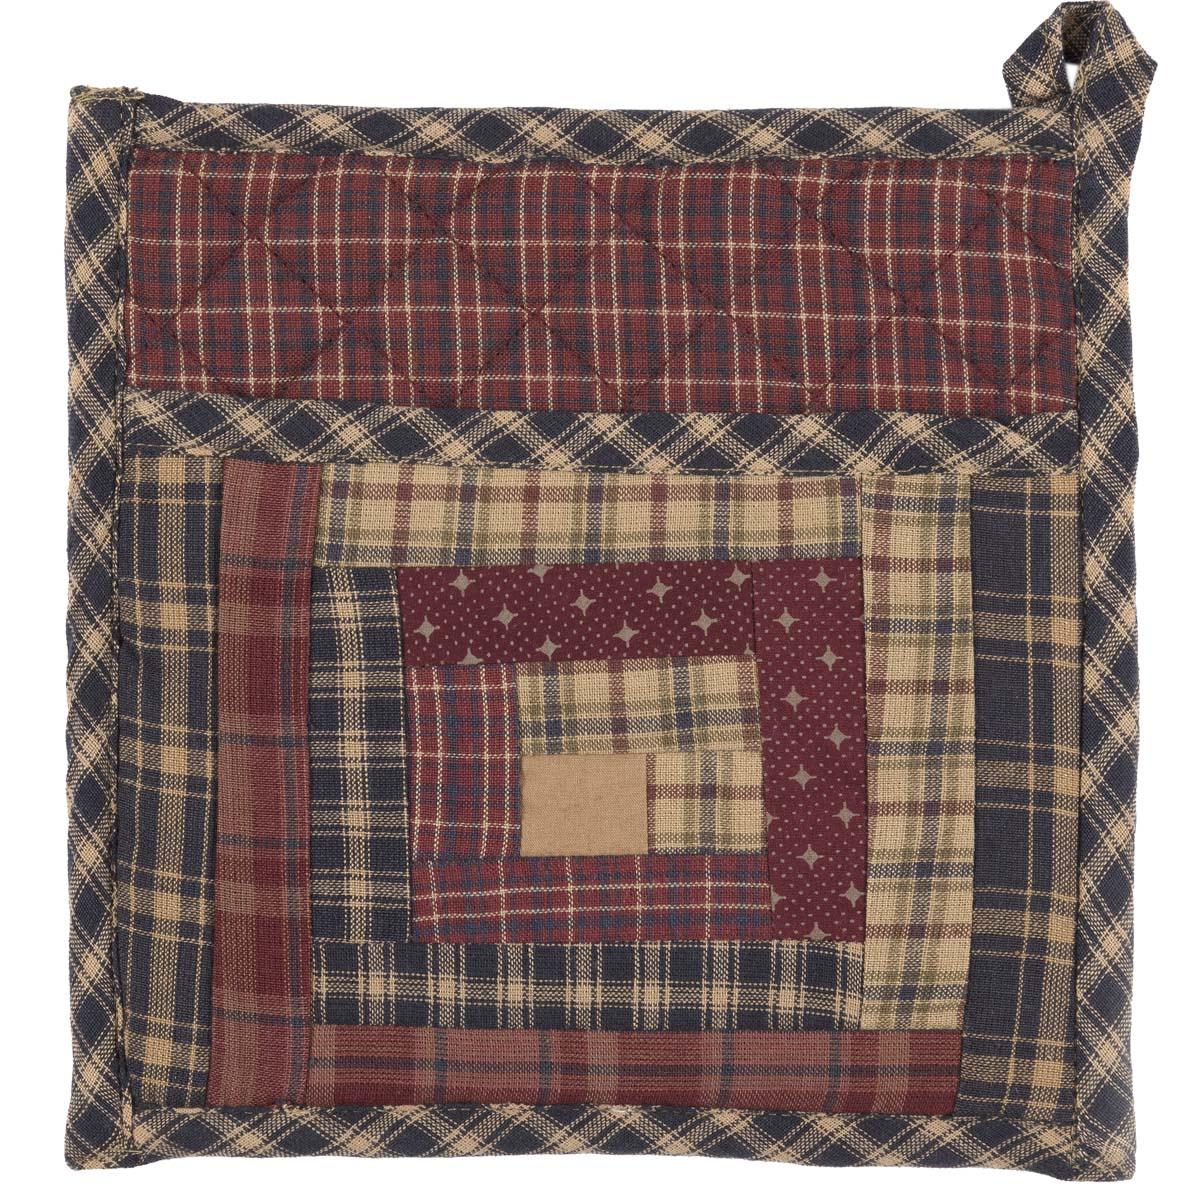 Millsboro Pot Holder Patch with Pocket 8x8